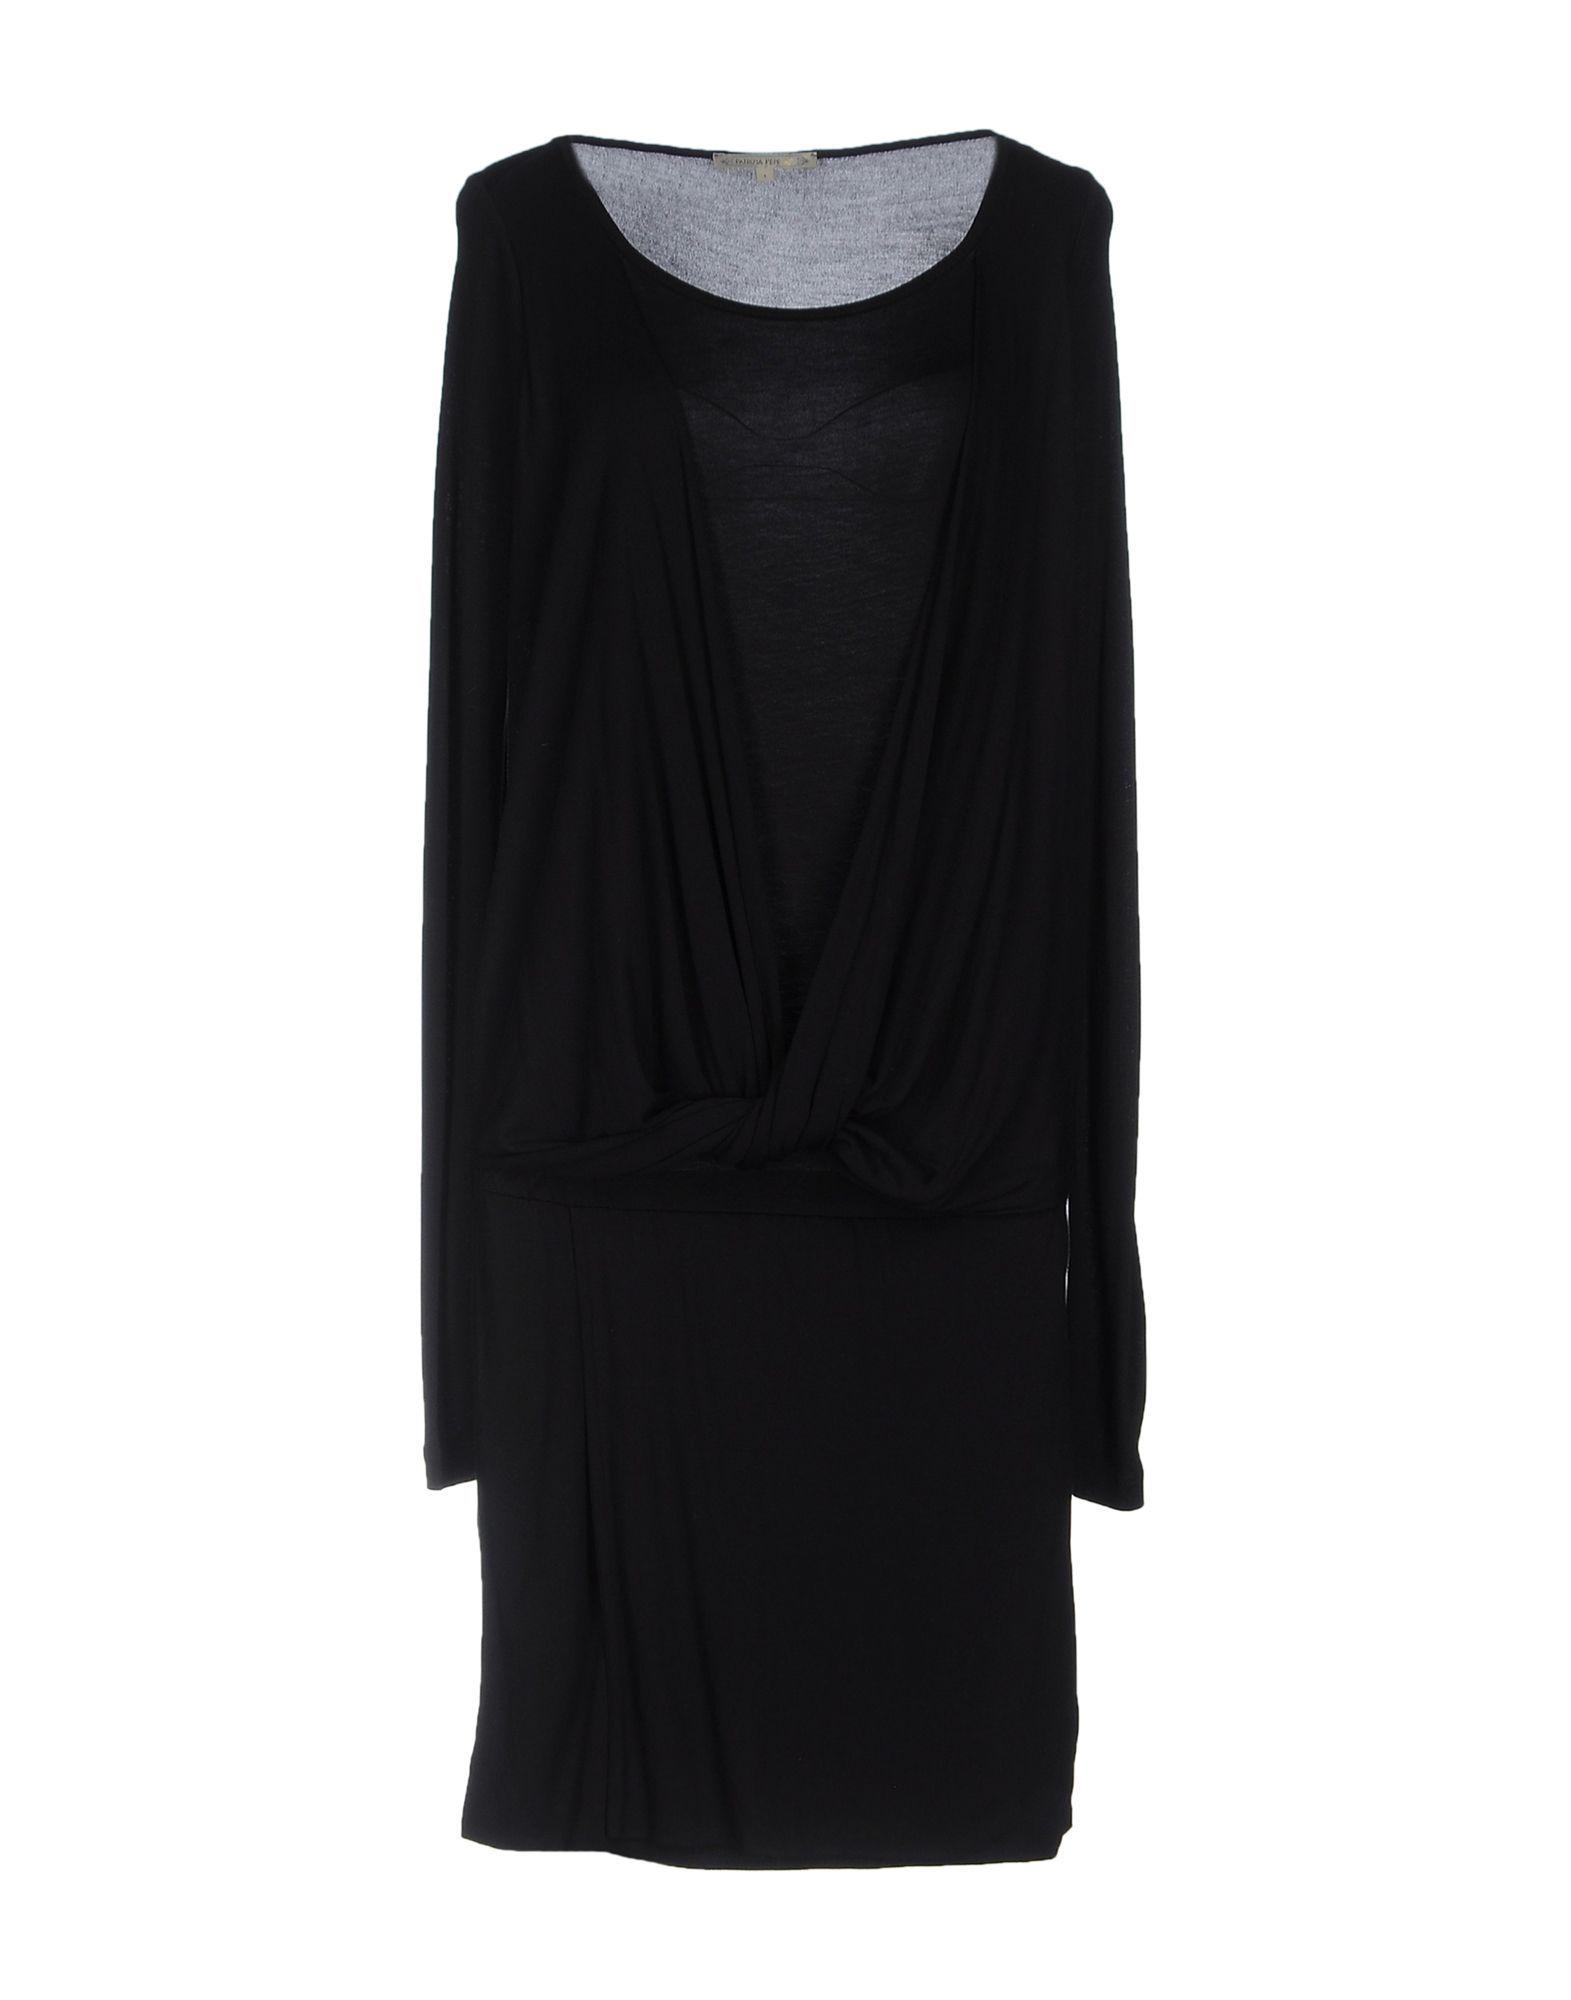 DRESSES Patrizia Pepe Black Woman Viscose